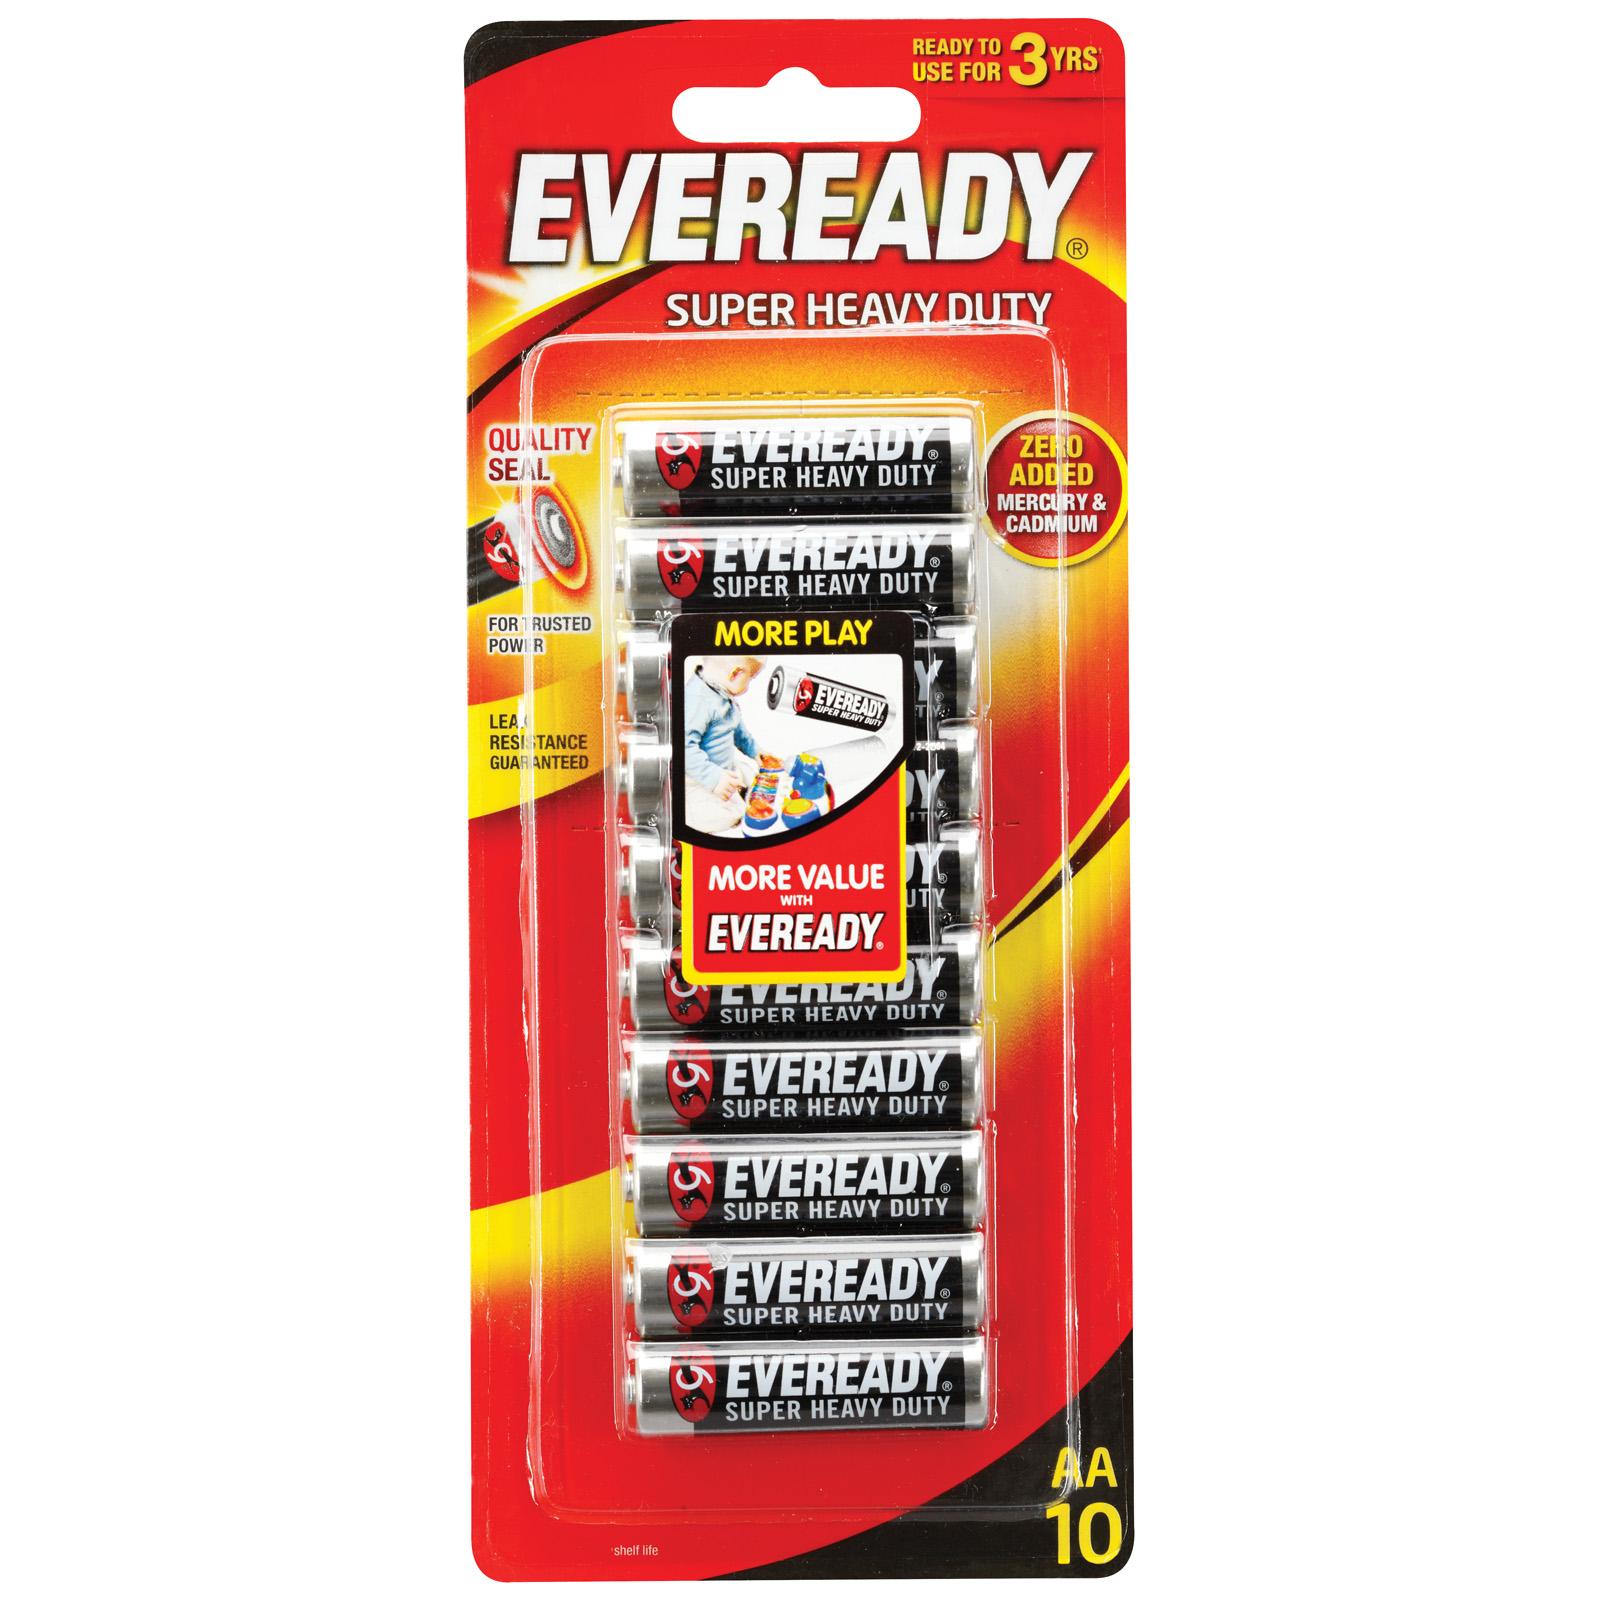 Eveready 1215 AA Carbon Zinc Battery (box/12pkt)